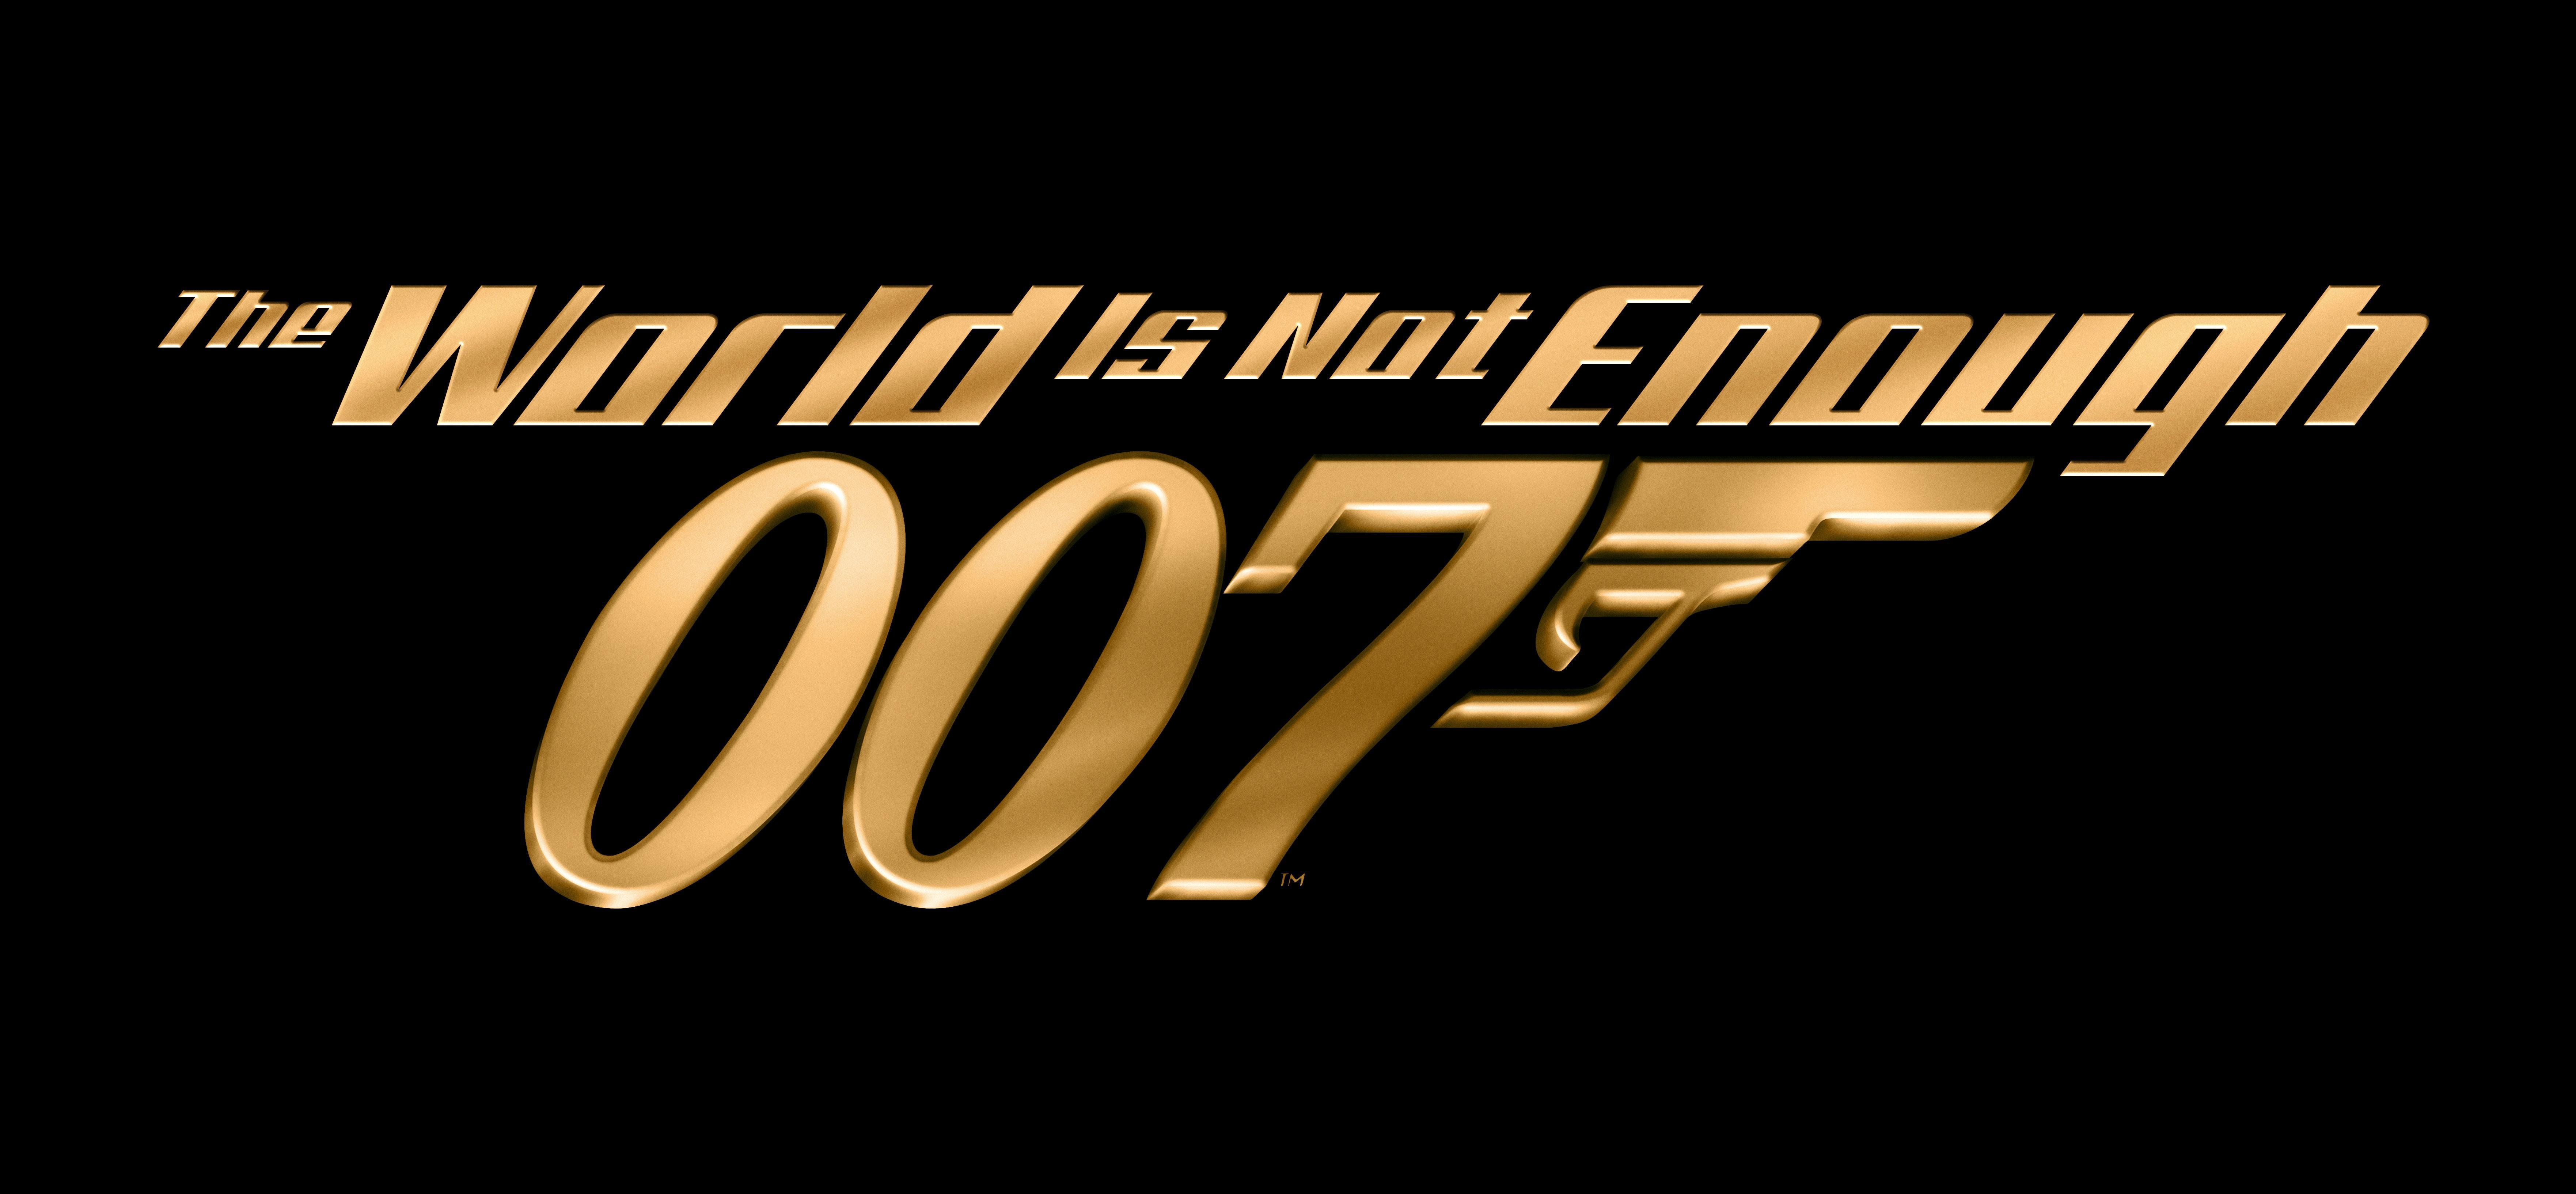 [47+] 007 Logo Wallpaper on WallpaperSafari